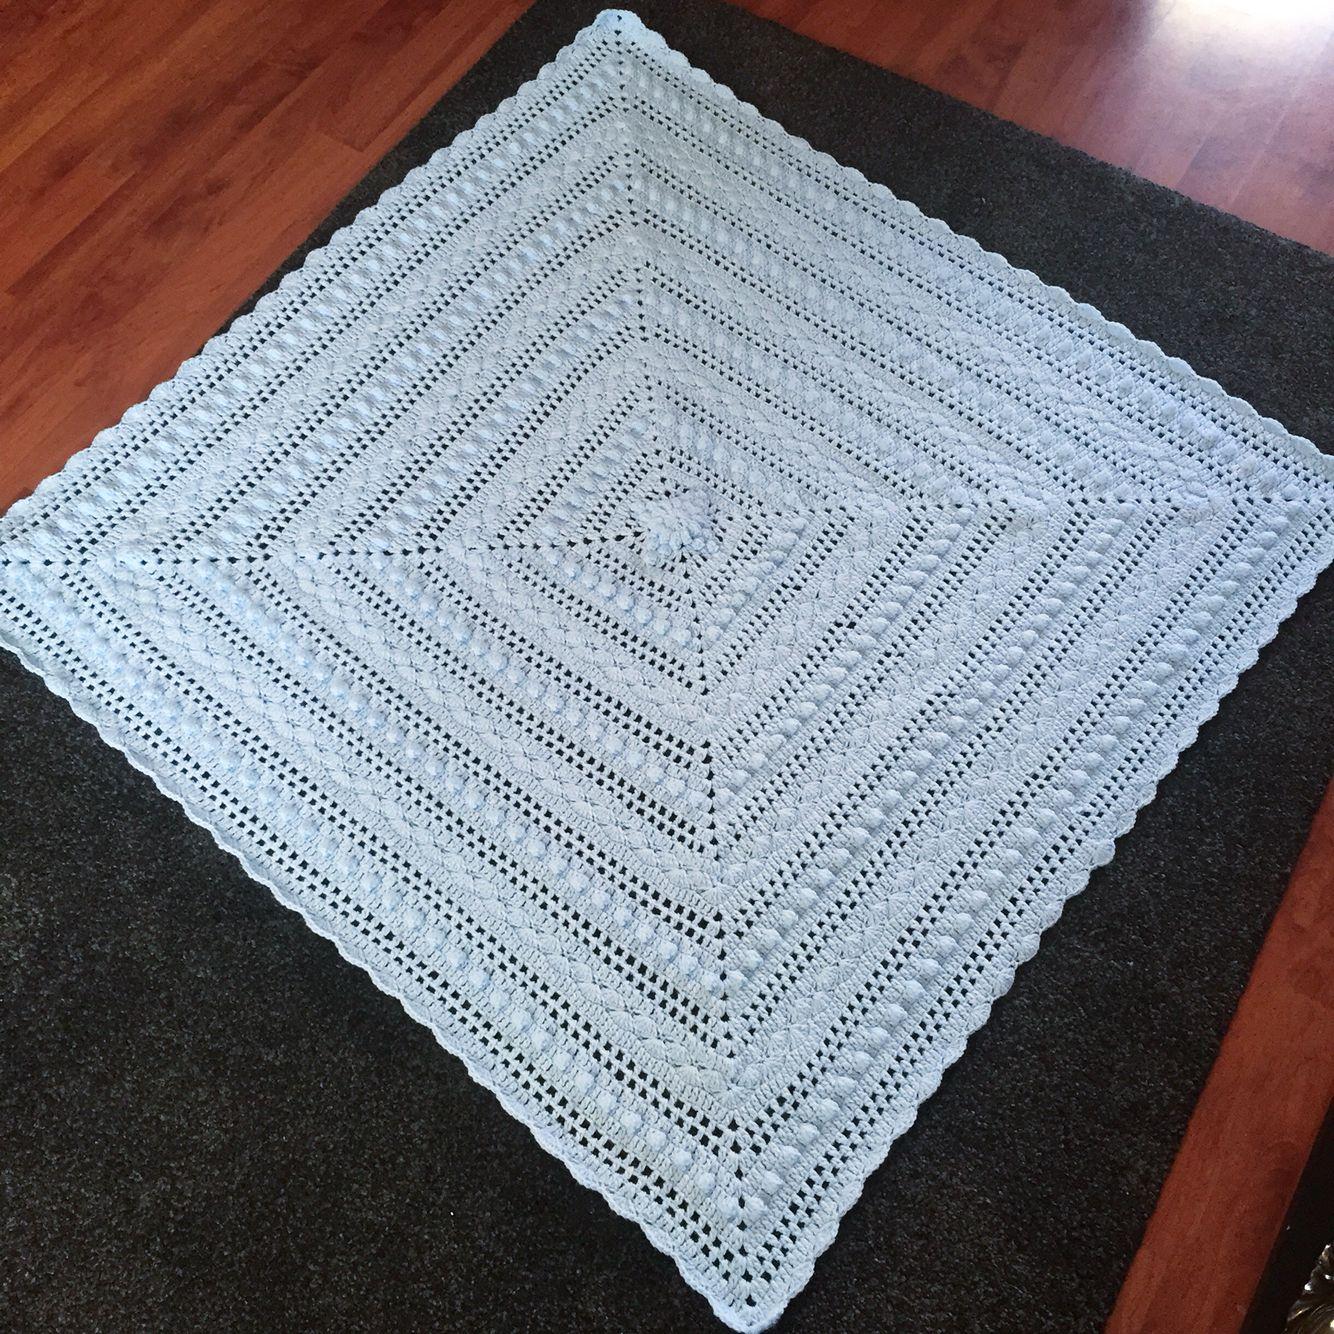 Crochet Lace Blanket \'Lace Baby Blanket\' pattern by Amy Dorr \'Baby ...